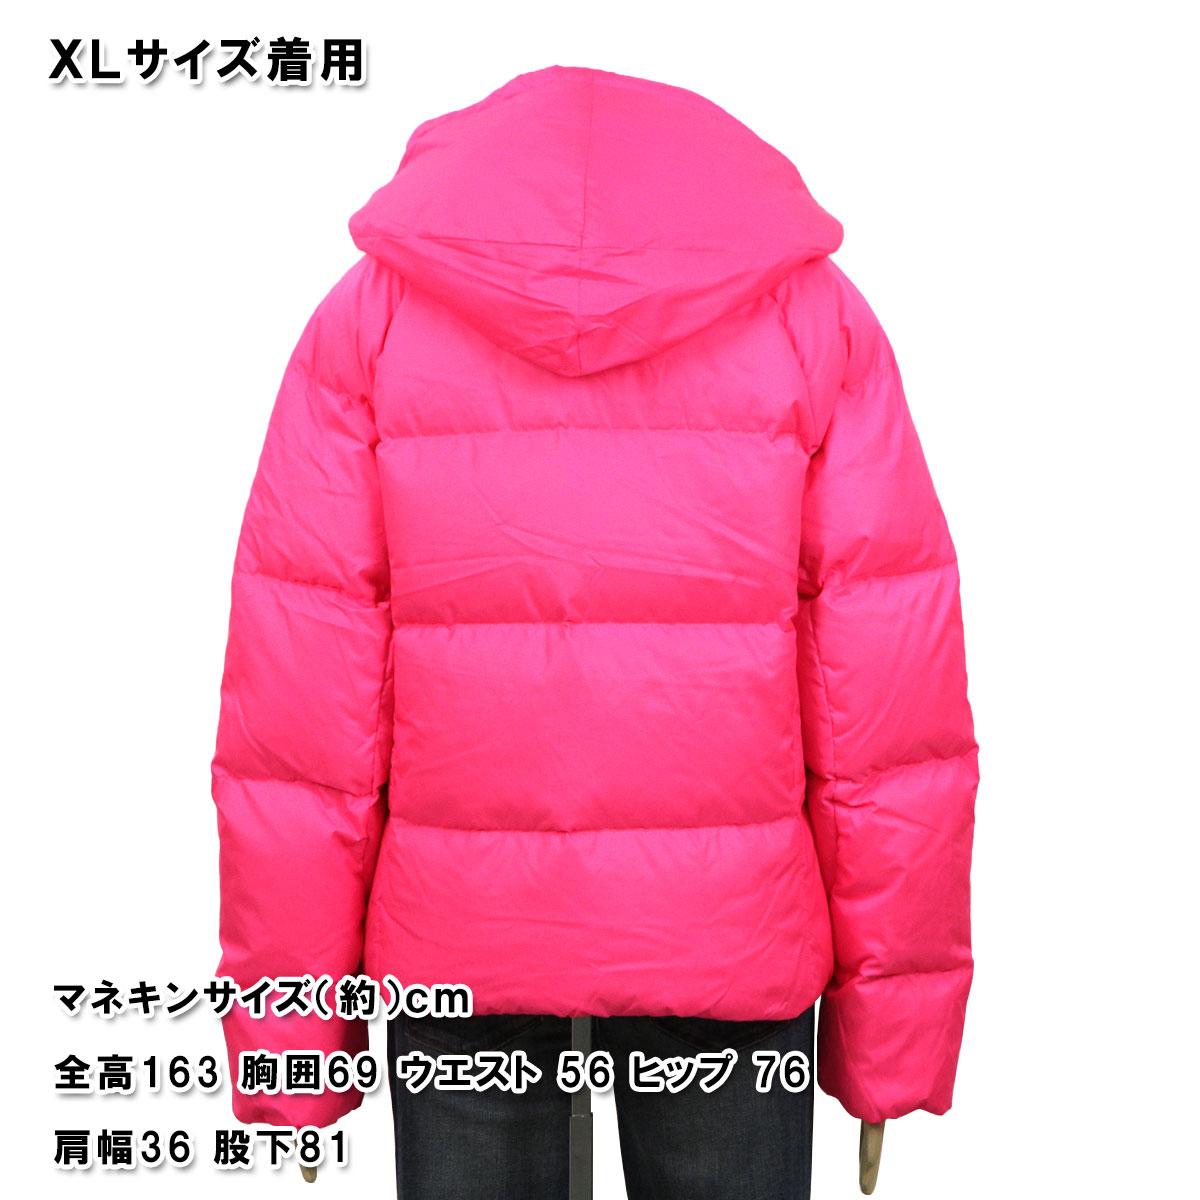 ec0ef6682a32f ... aliexpress poloralflorenkids polo ralph lauren children genuine kids  clothing girls down jacket quilted down jacket 66152466